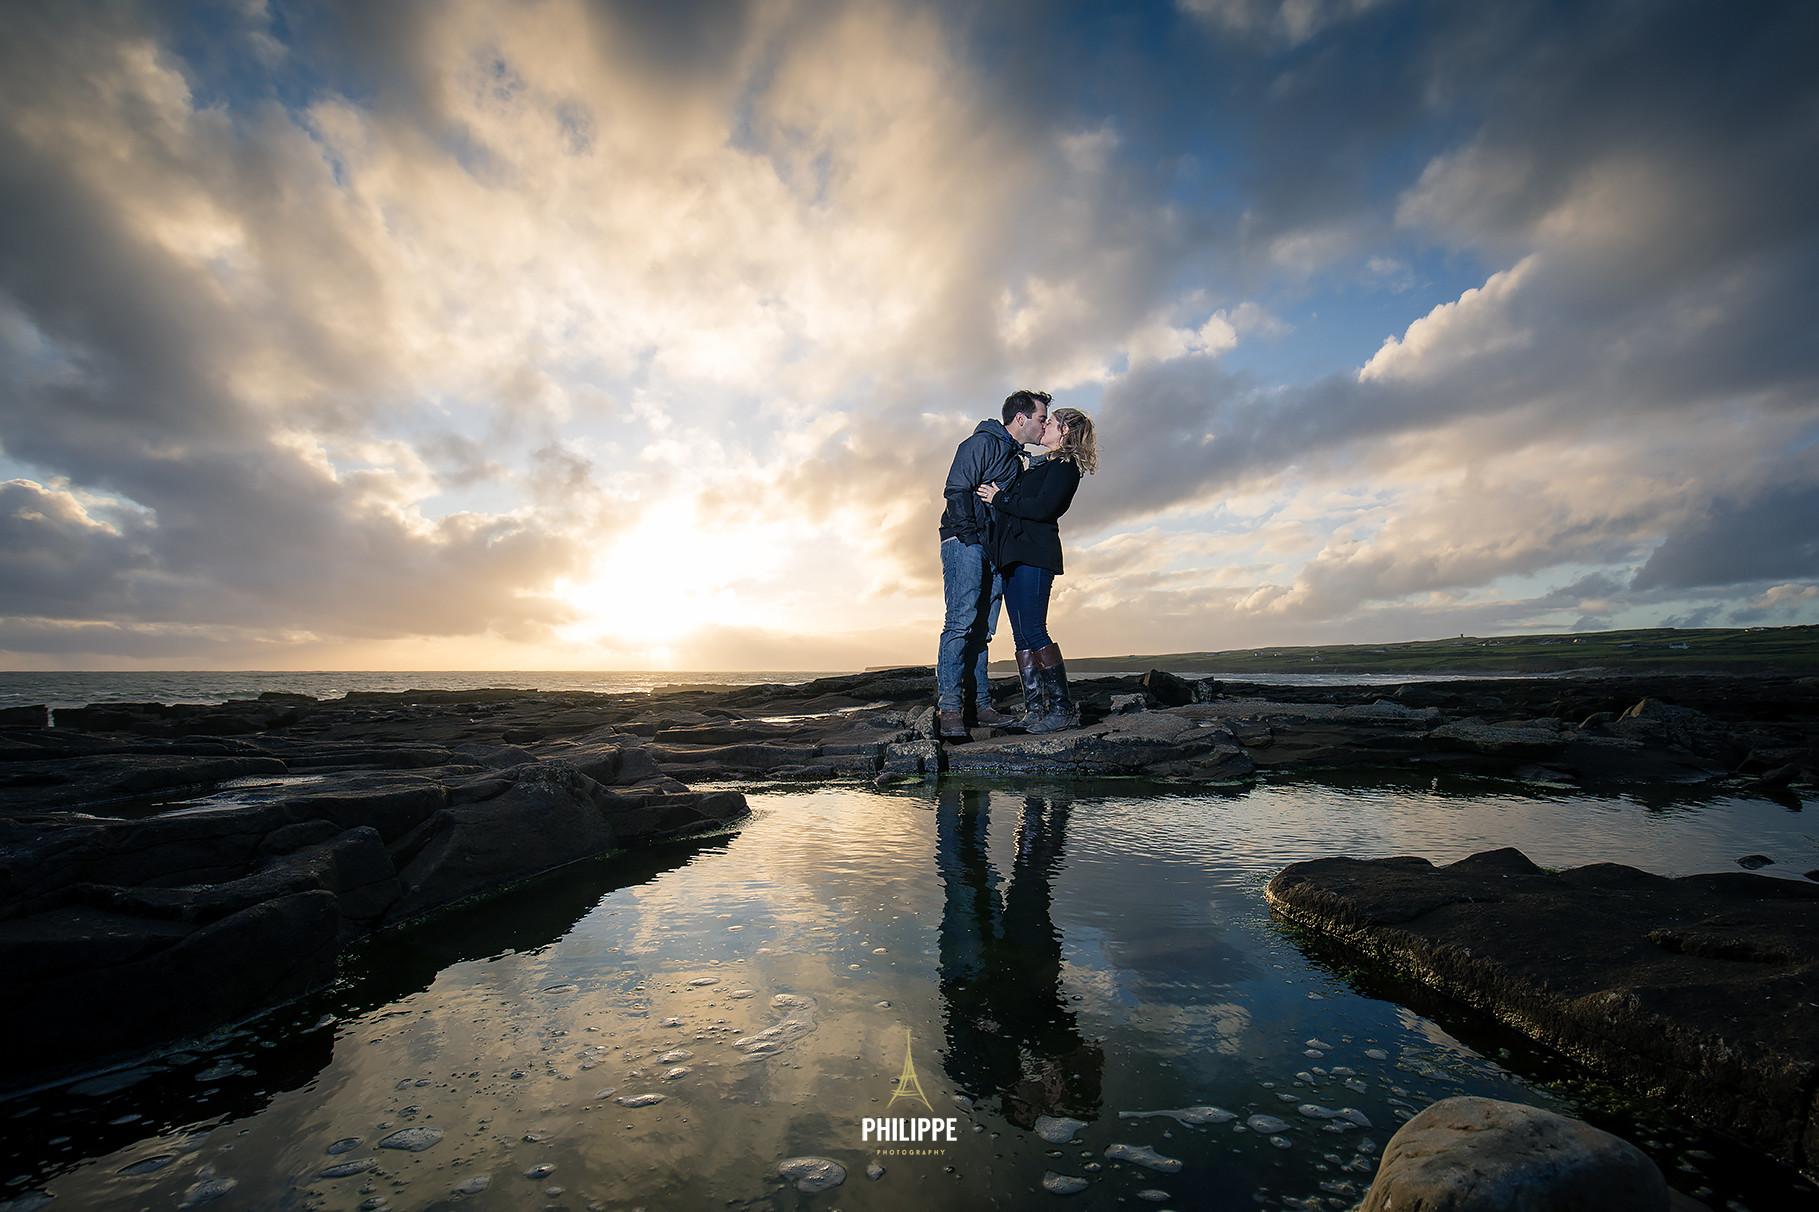 Ireland-Clare-wedding-photography-Philippe-engagement-cliffs-Kyle2